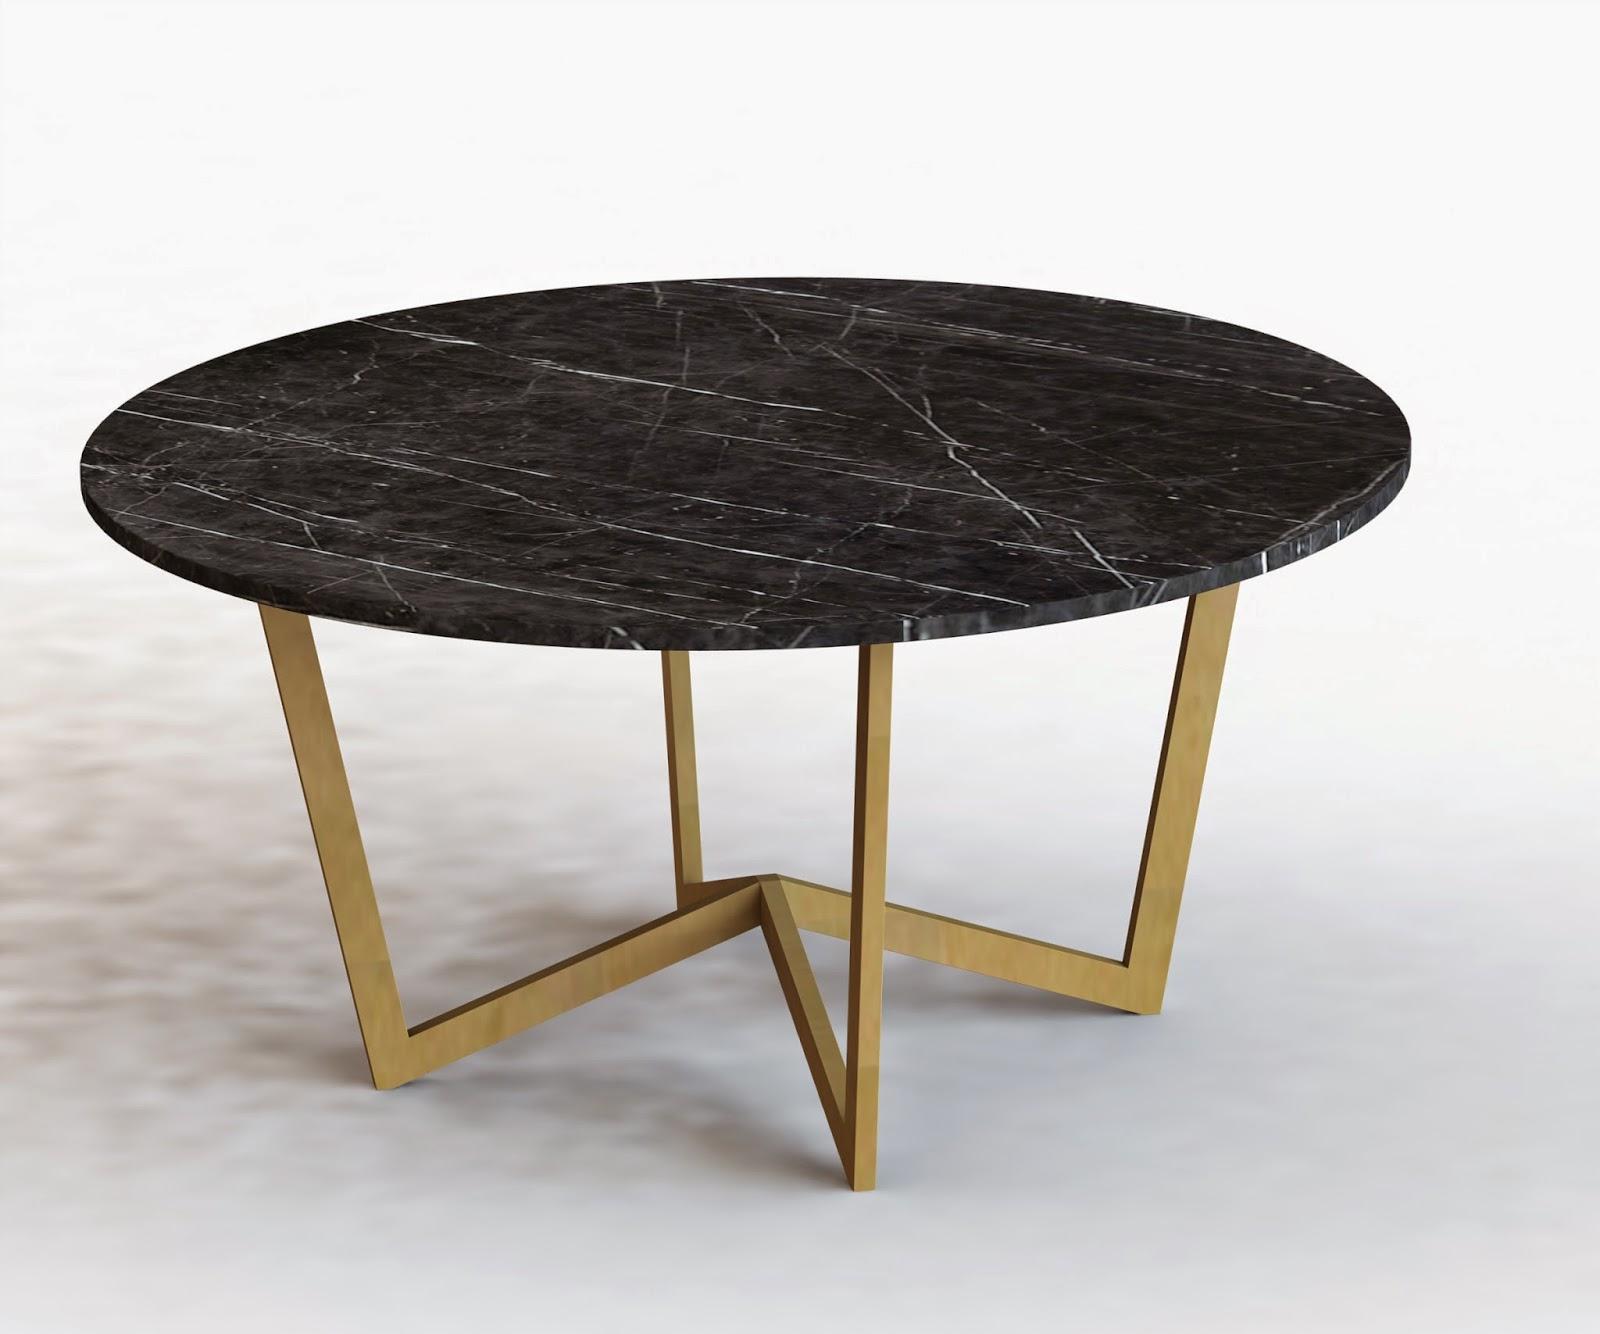 urban ironcraft walter metal table base. Black Bedroom Furniture Sets. Home Design Ideas